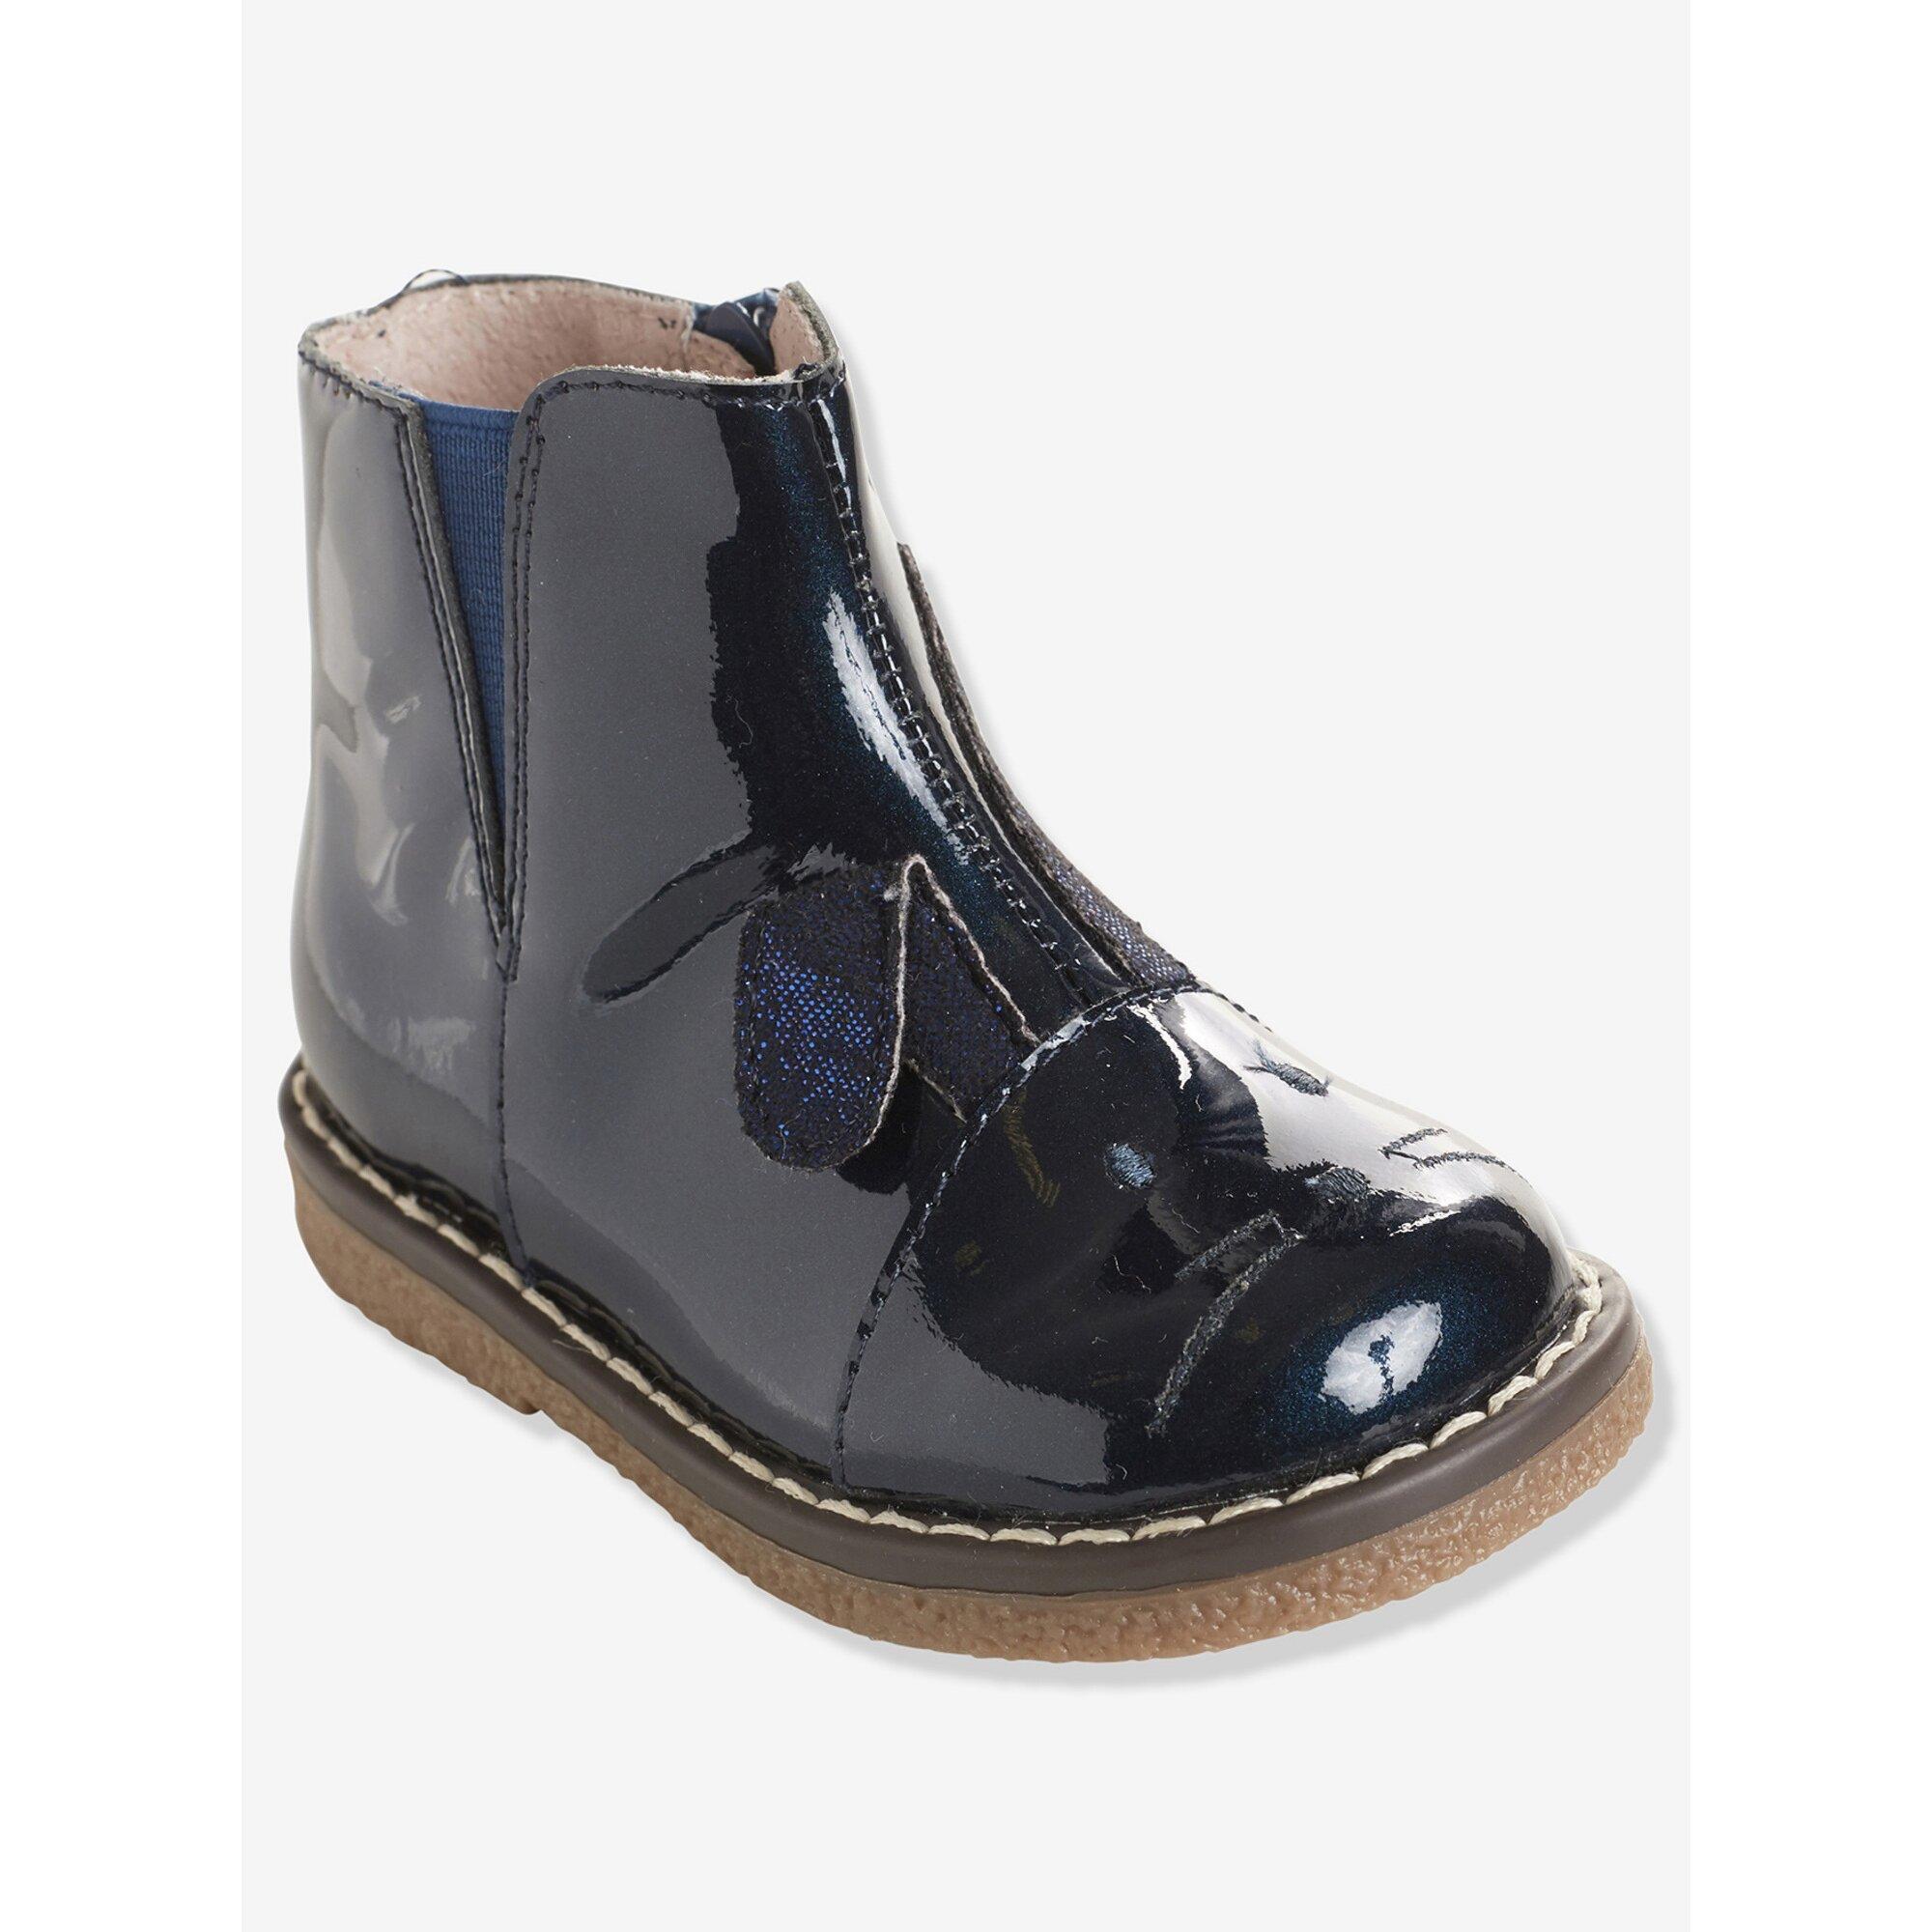 vertbaudet-madchen-boots-aus-leder-hase